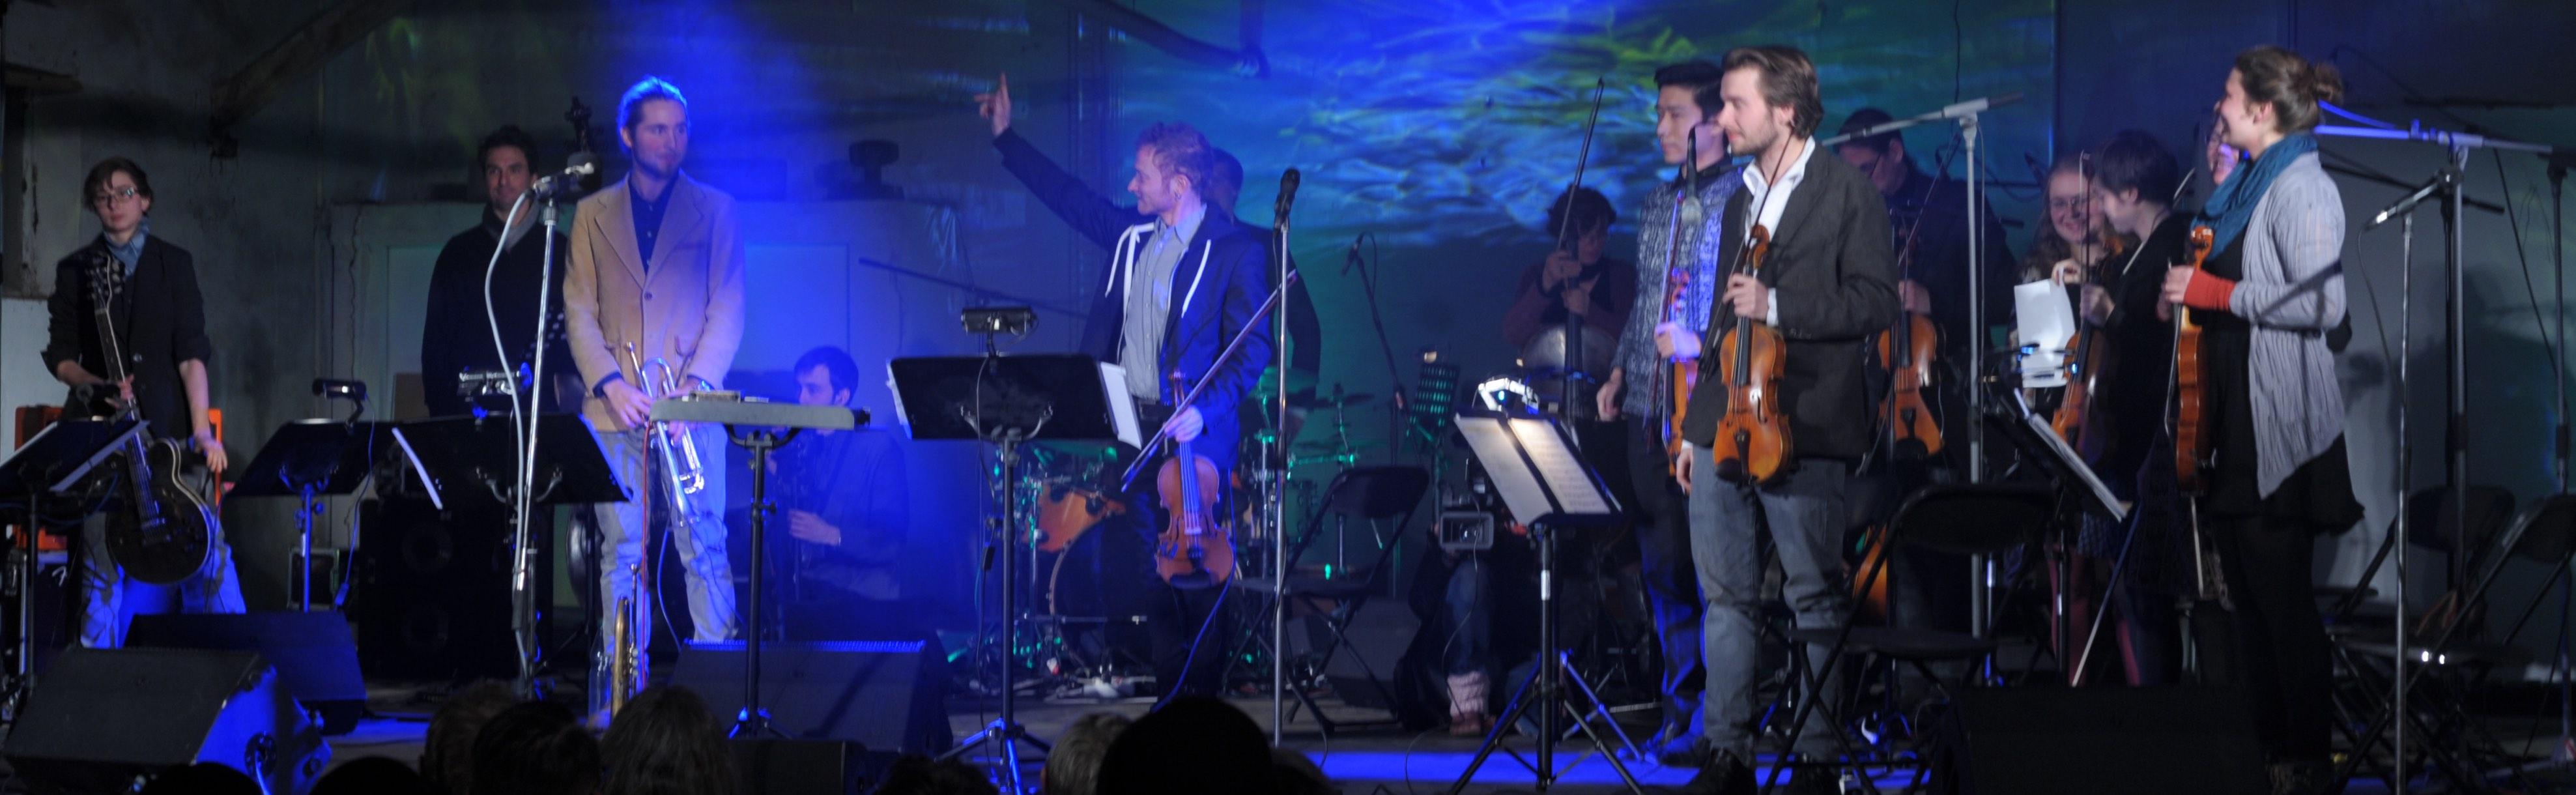 Klezphonik light orchestra johannes paul gr er for Lit orchestra